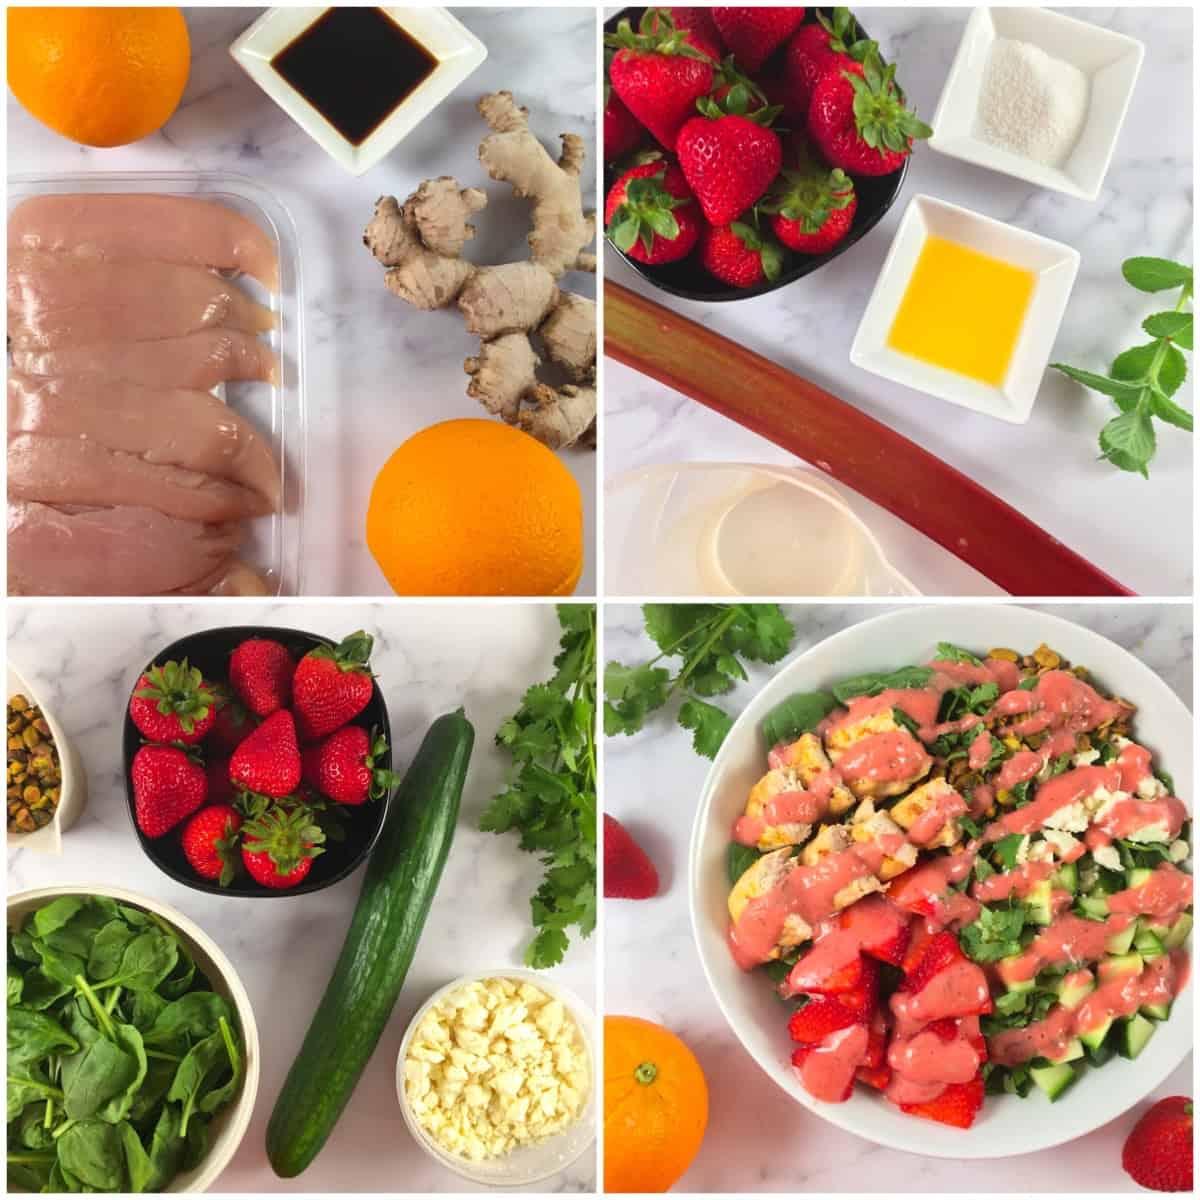 chicken salad with strawberries ingredients